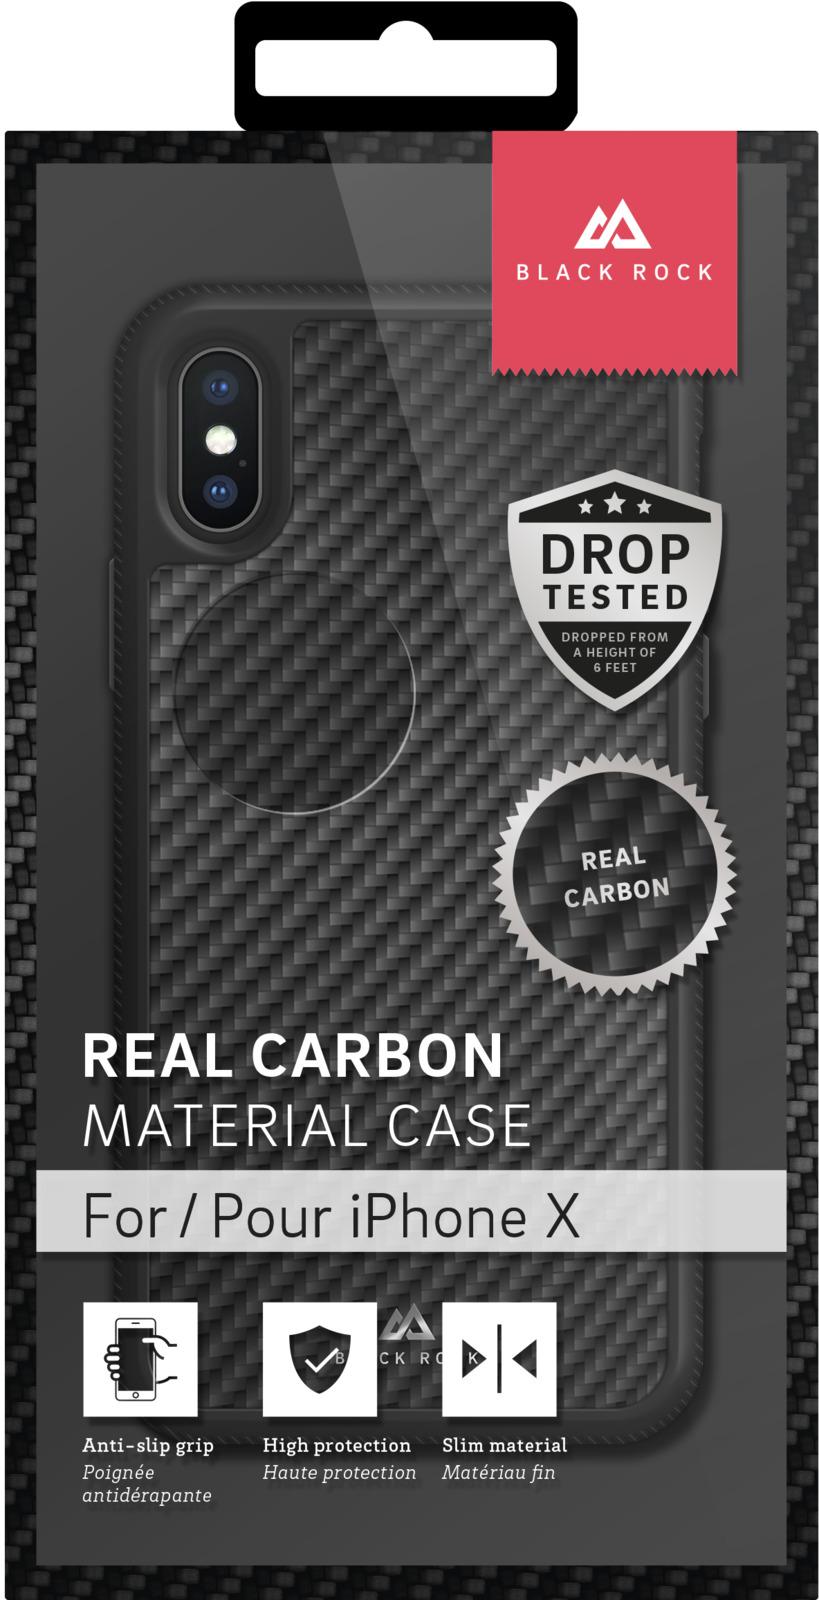 Чехол Black Rock Material Case Real Carbon для Apple iPhone X, цвет: черный